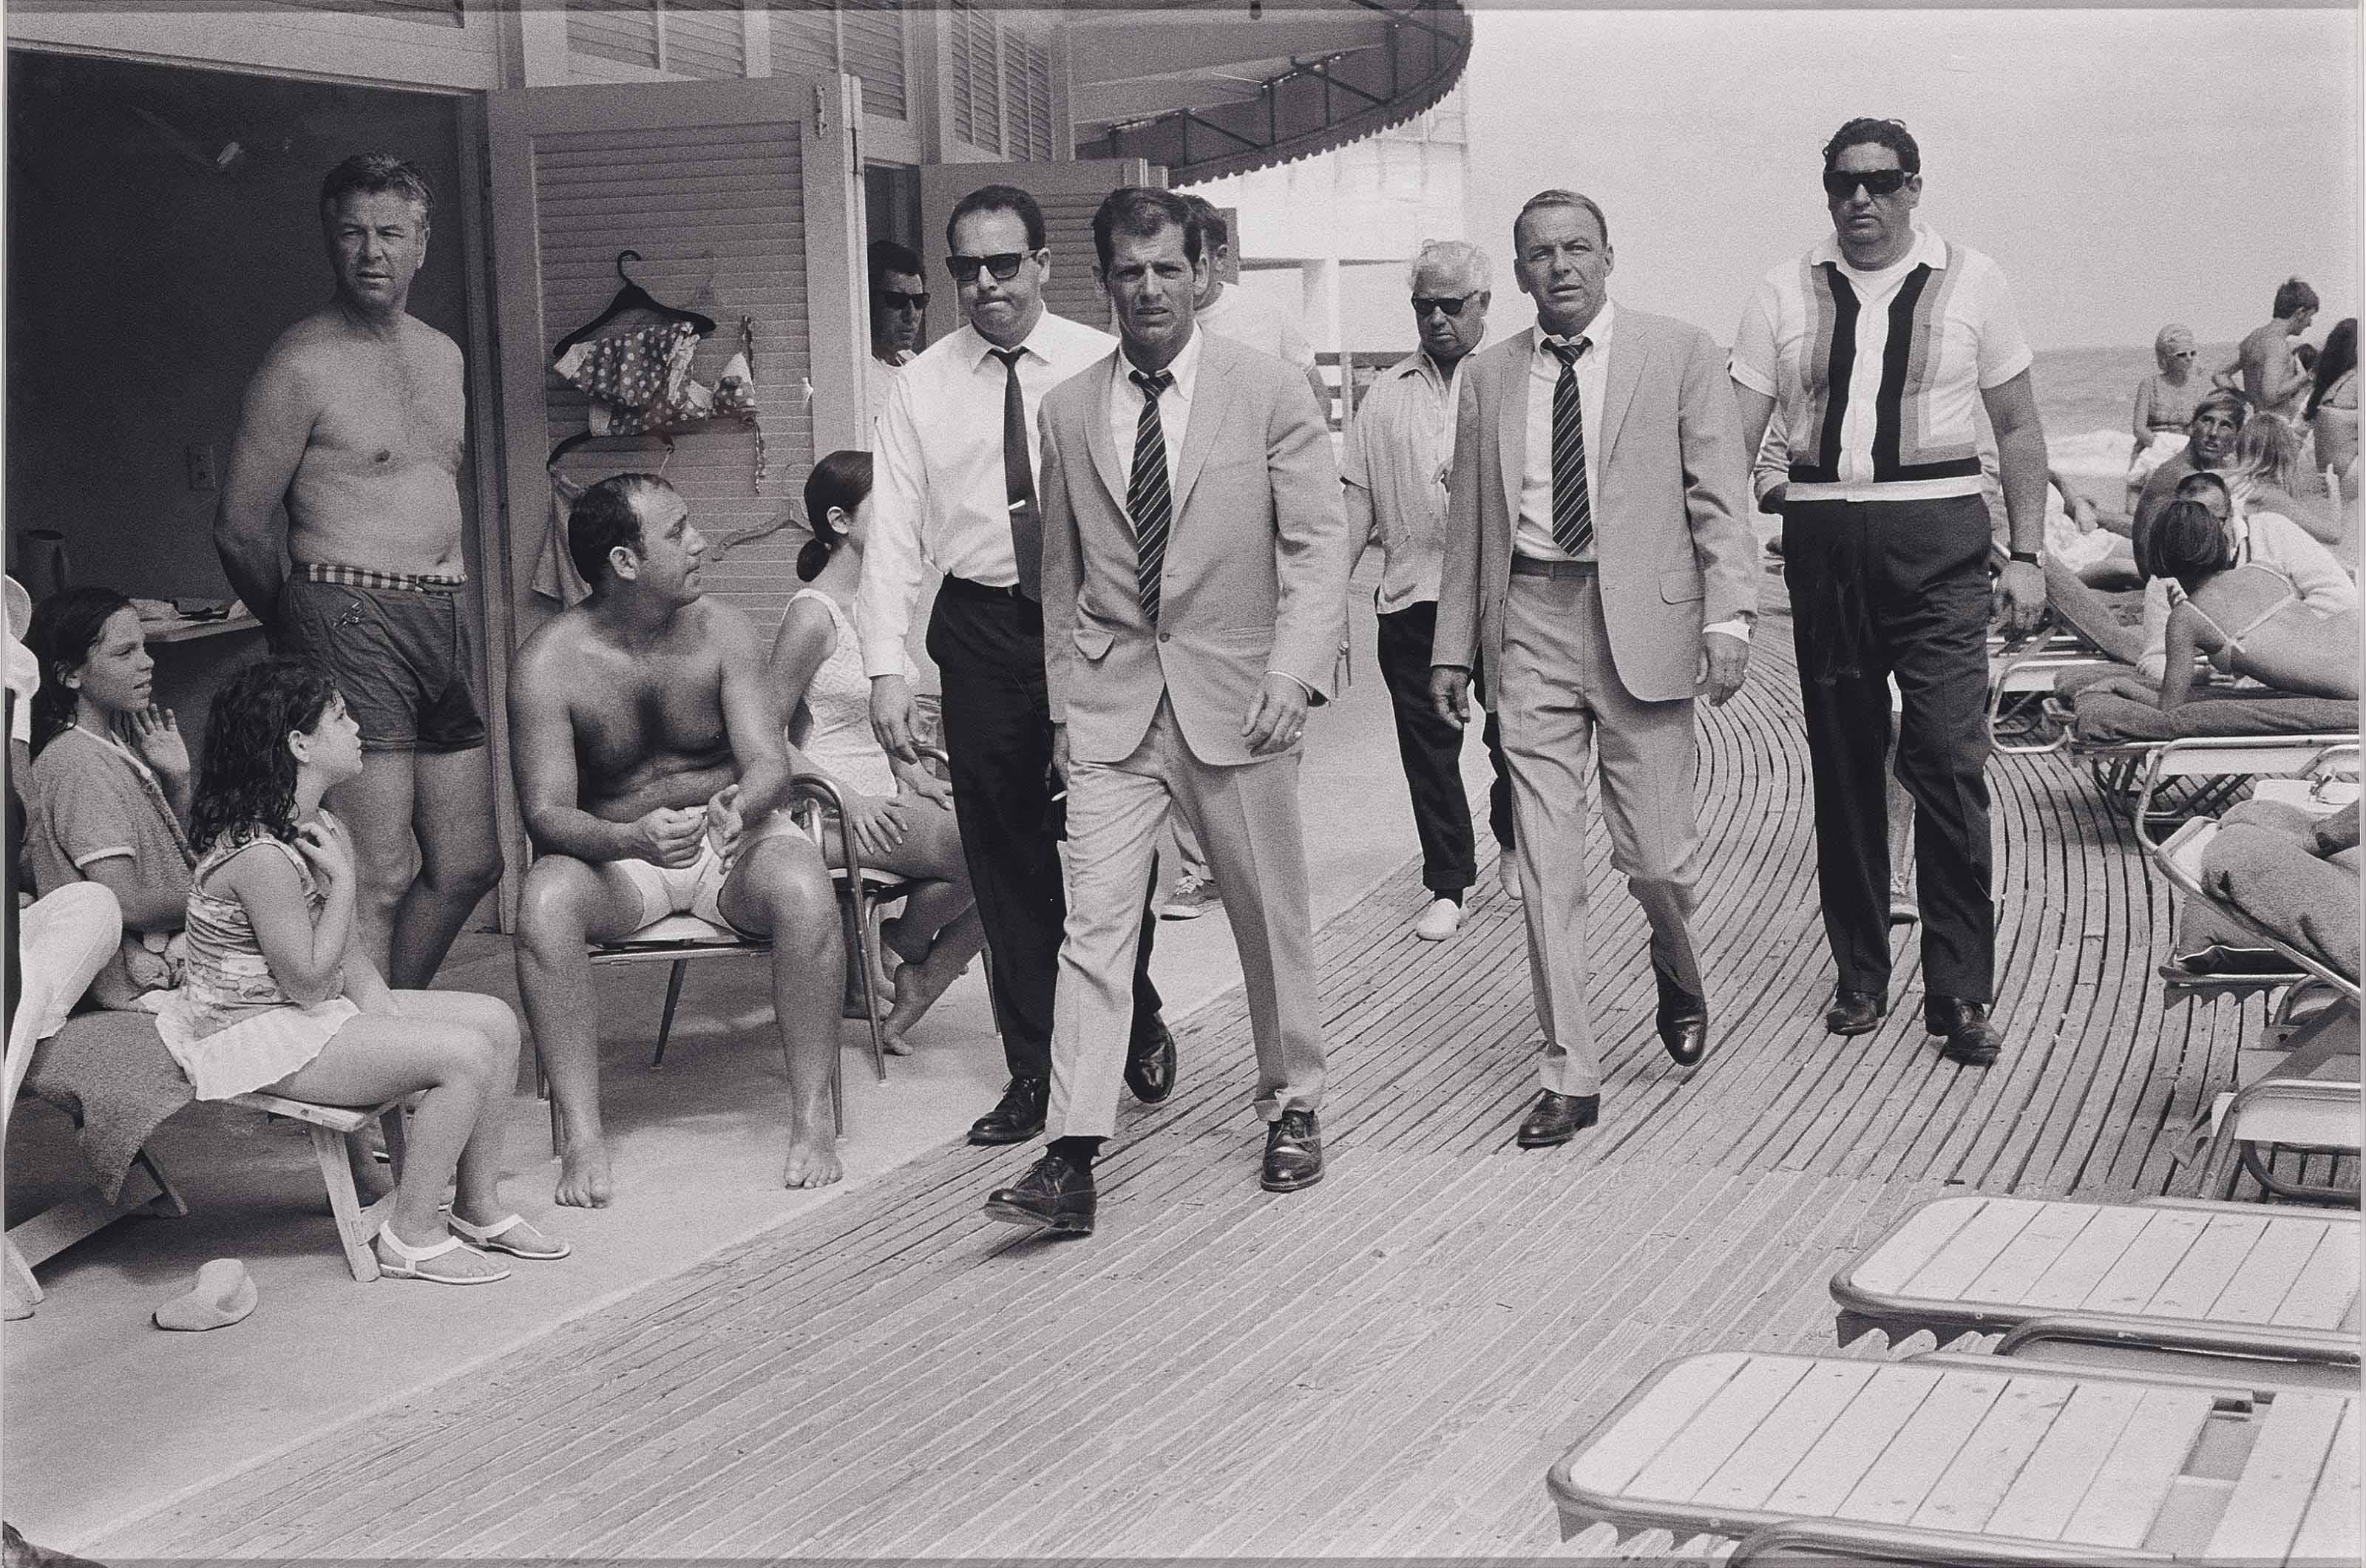 Frank Sinatra and Bodyguards, Miami Beach, 1968